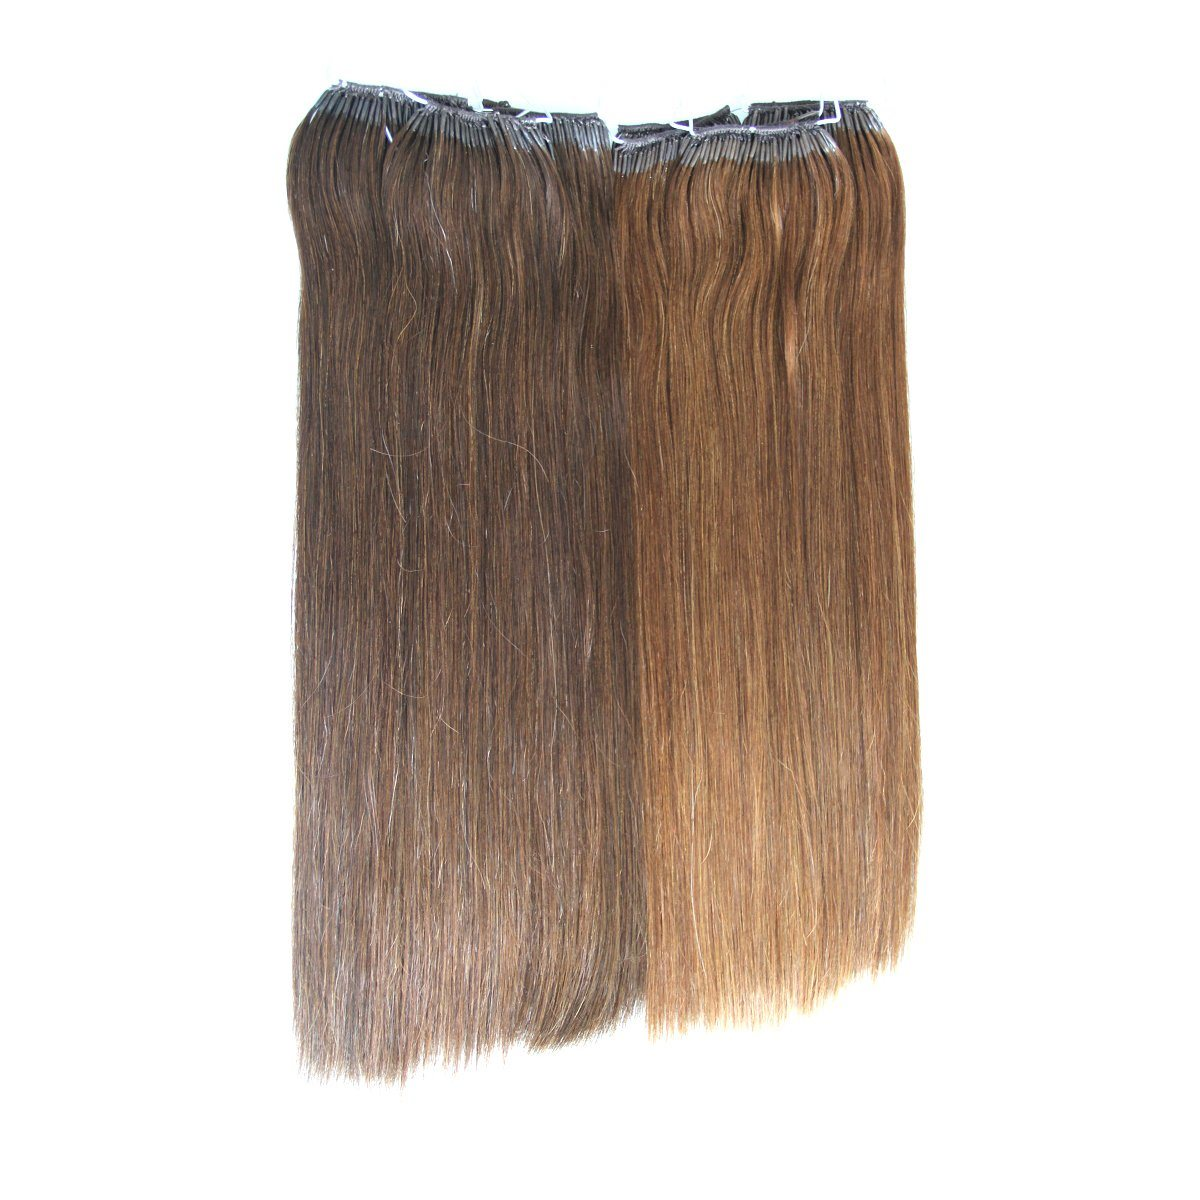 Korean Hair Extensions Qingdao Zhenrui Arts Crafts Co Ltd